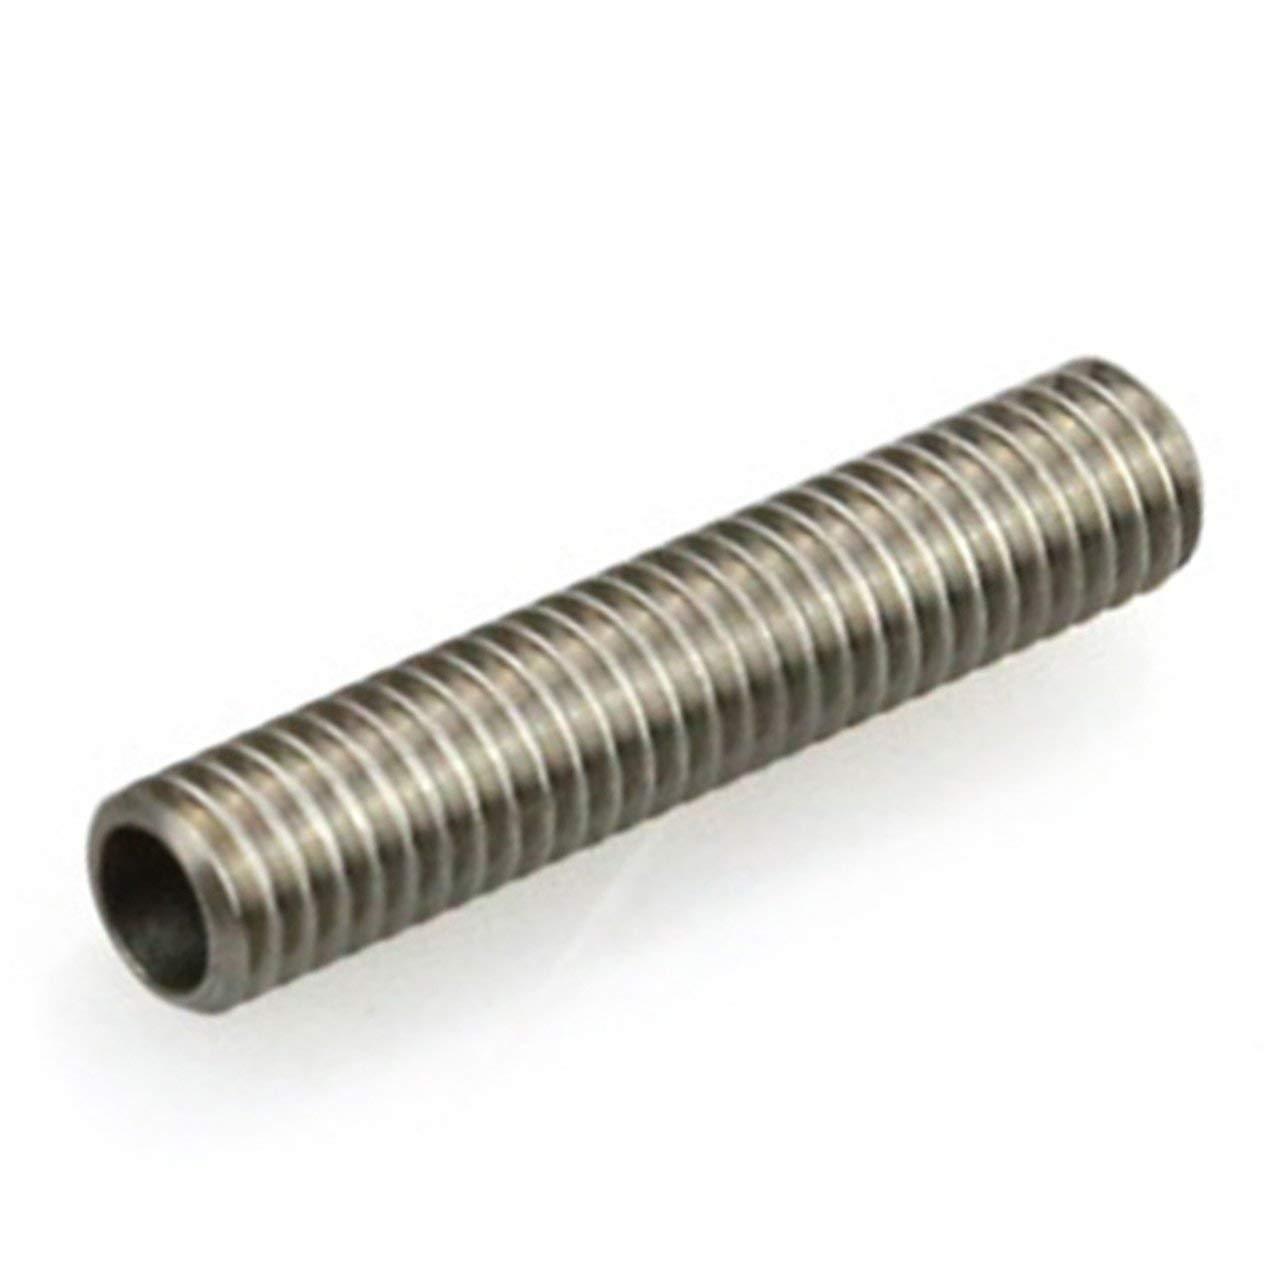 3D Printer Stainless Steel Tetrafluoro Thread Nozzles M6 Throat PTFE Tube for MK8 Tube Makerbot 3D Printer Extruder M6x30mm Jasnyfall silver